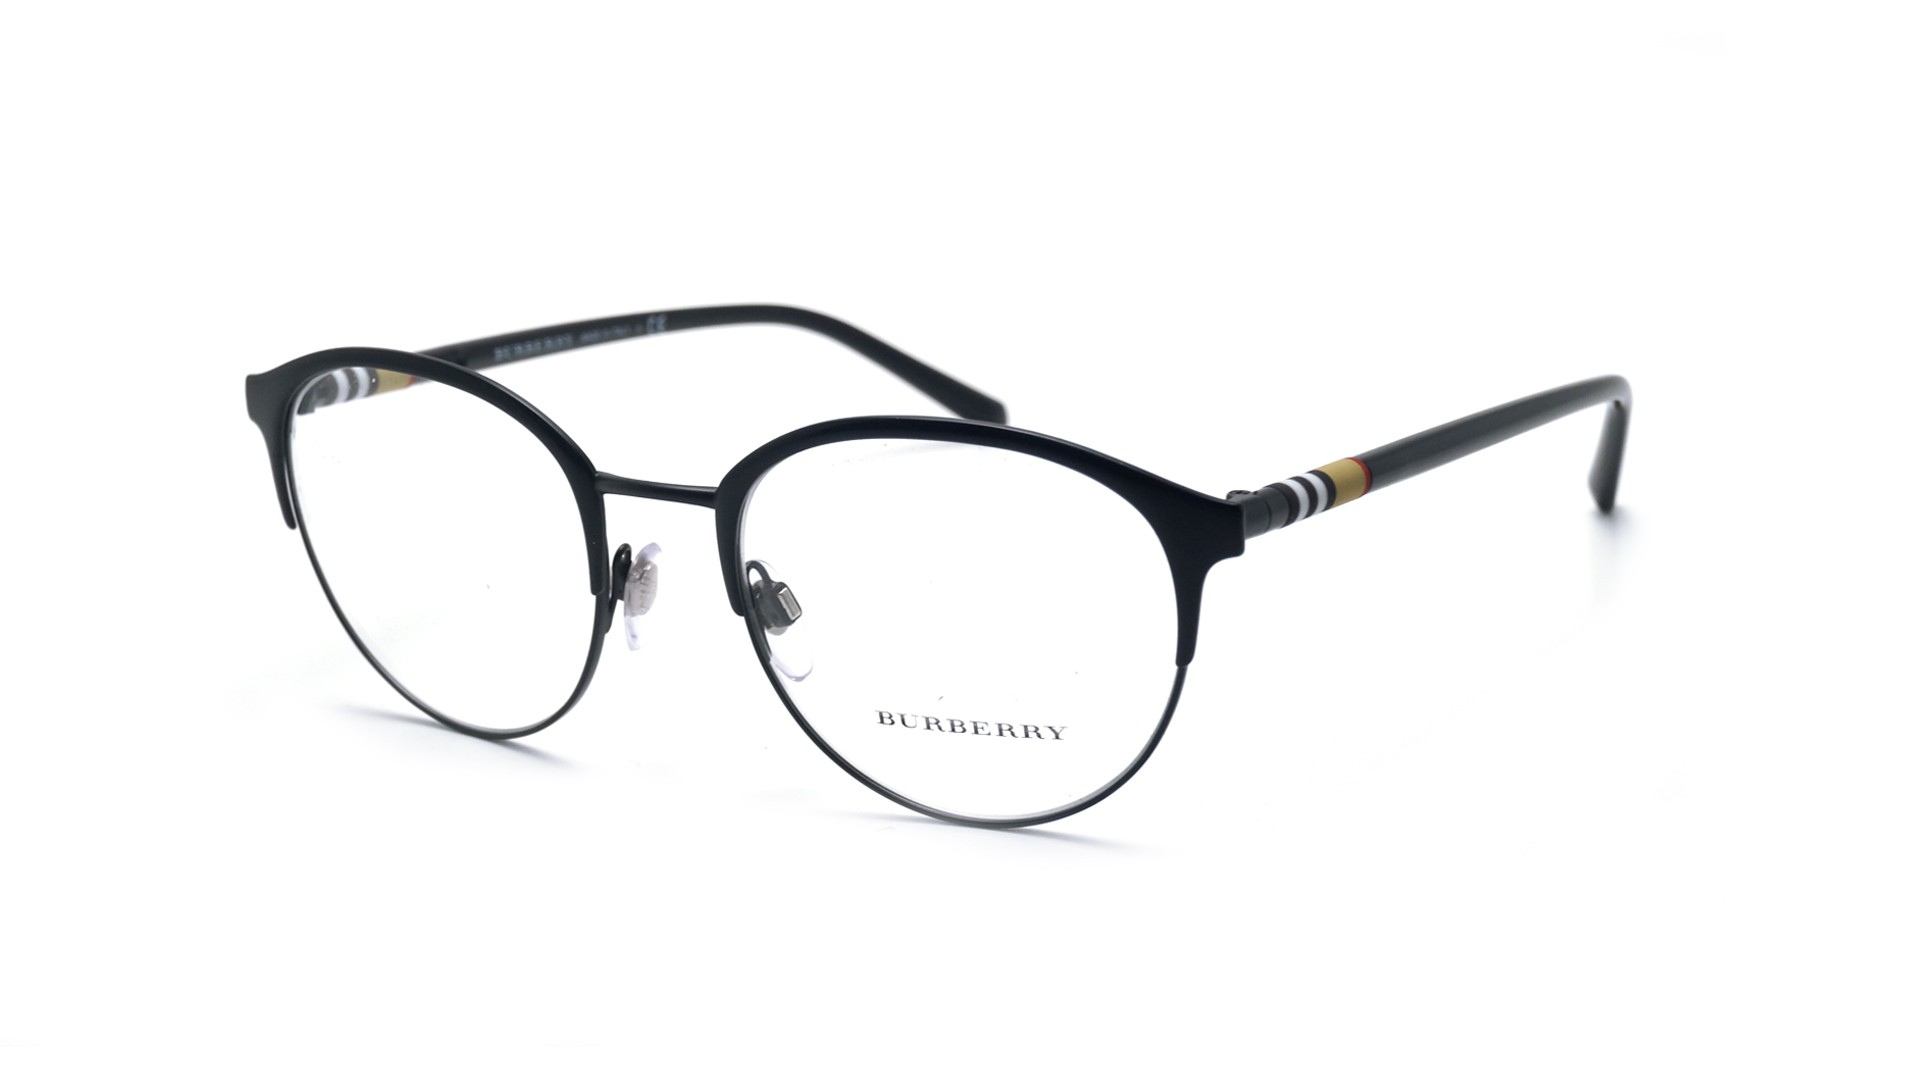 35c4d469e5 Eyeglasses Burberry BE1318 1252 51-19 Black Medium